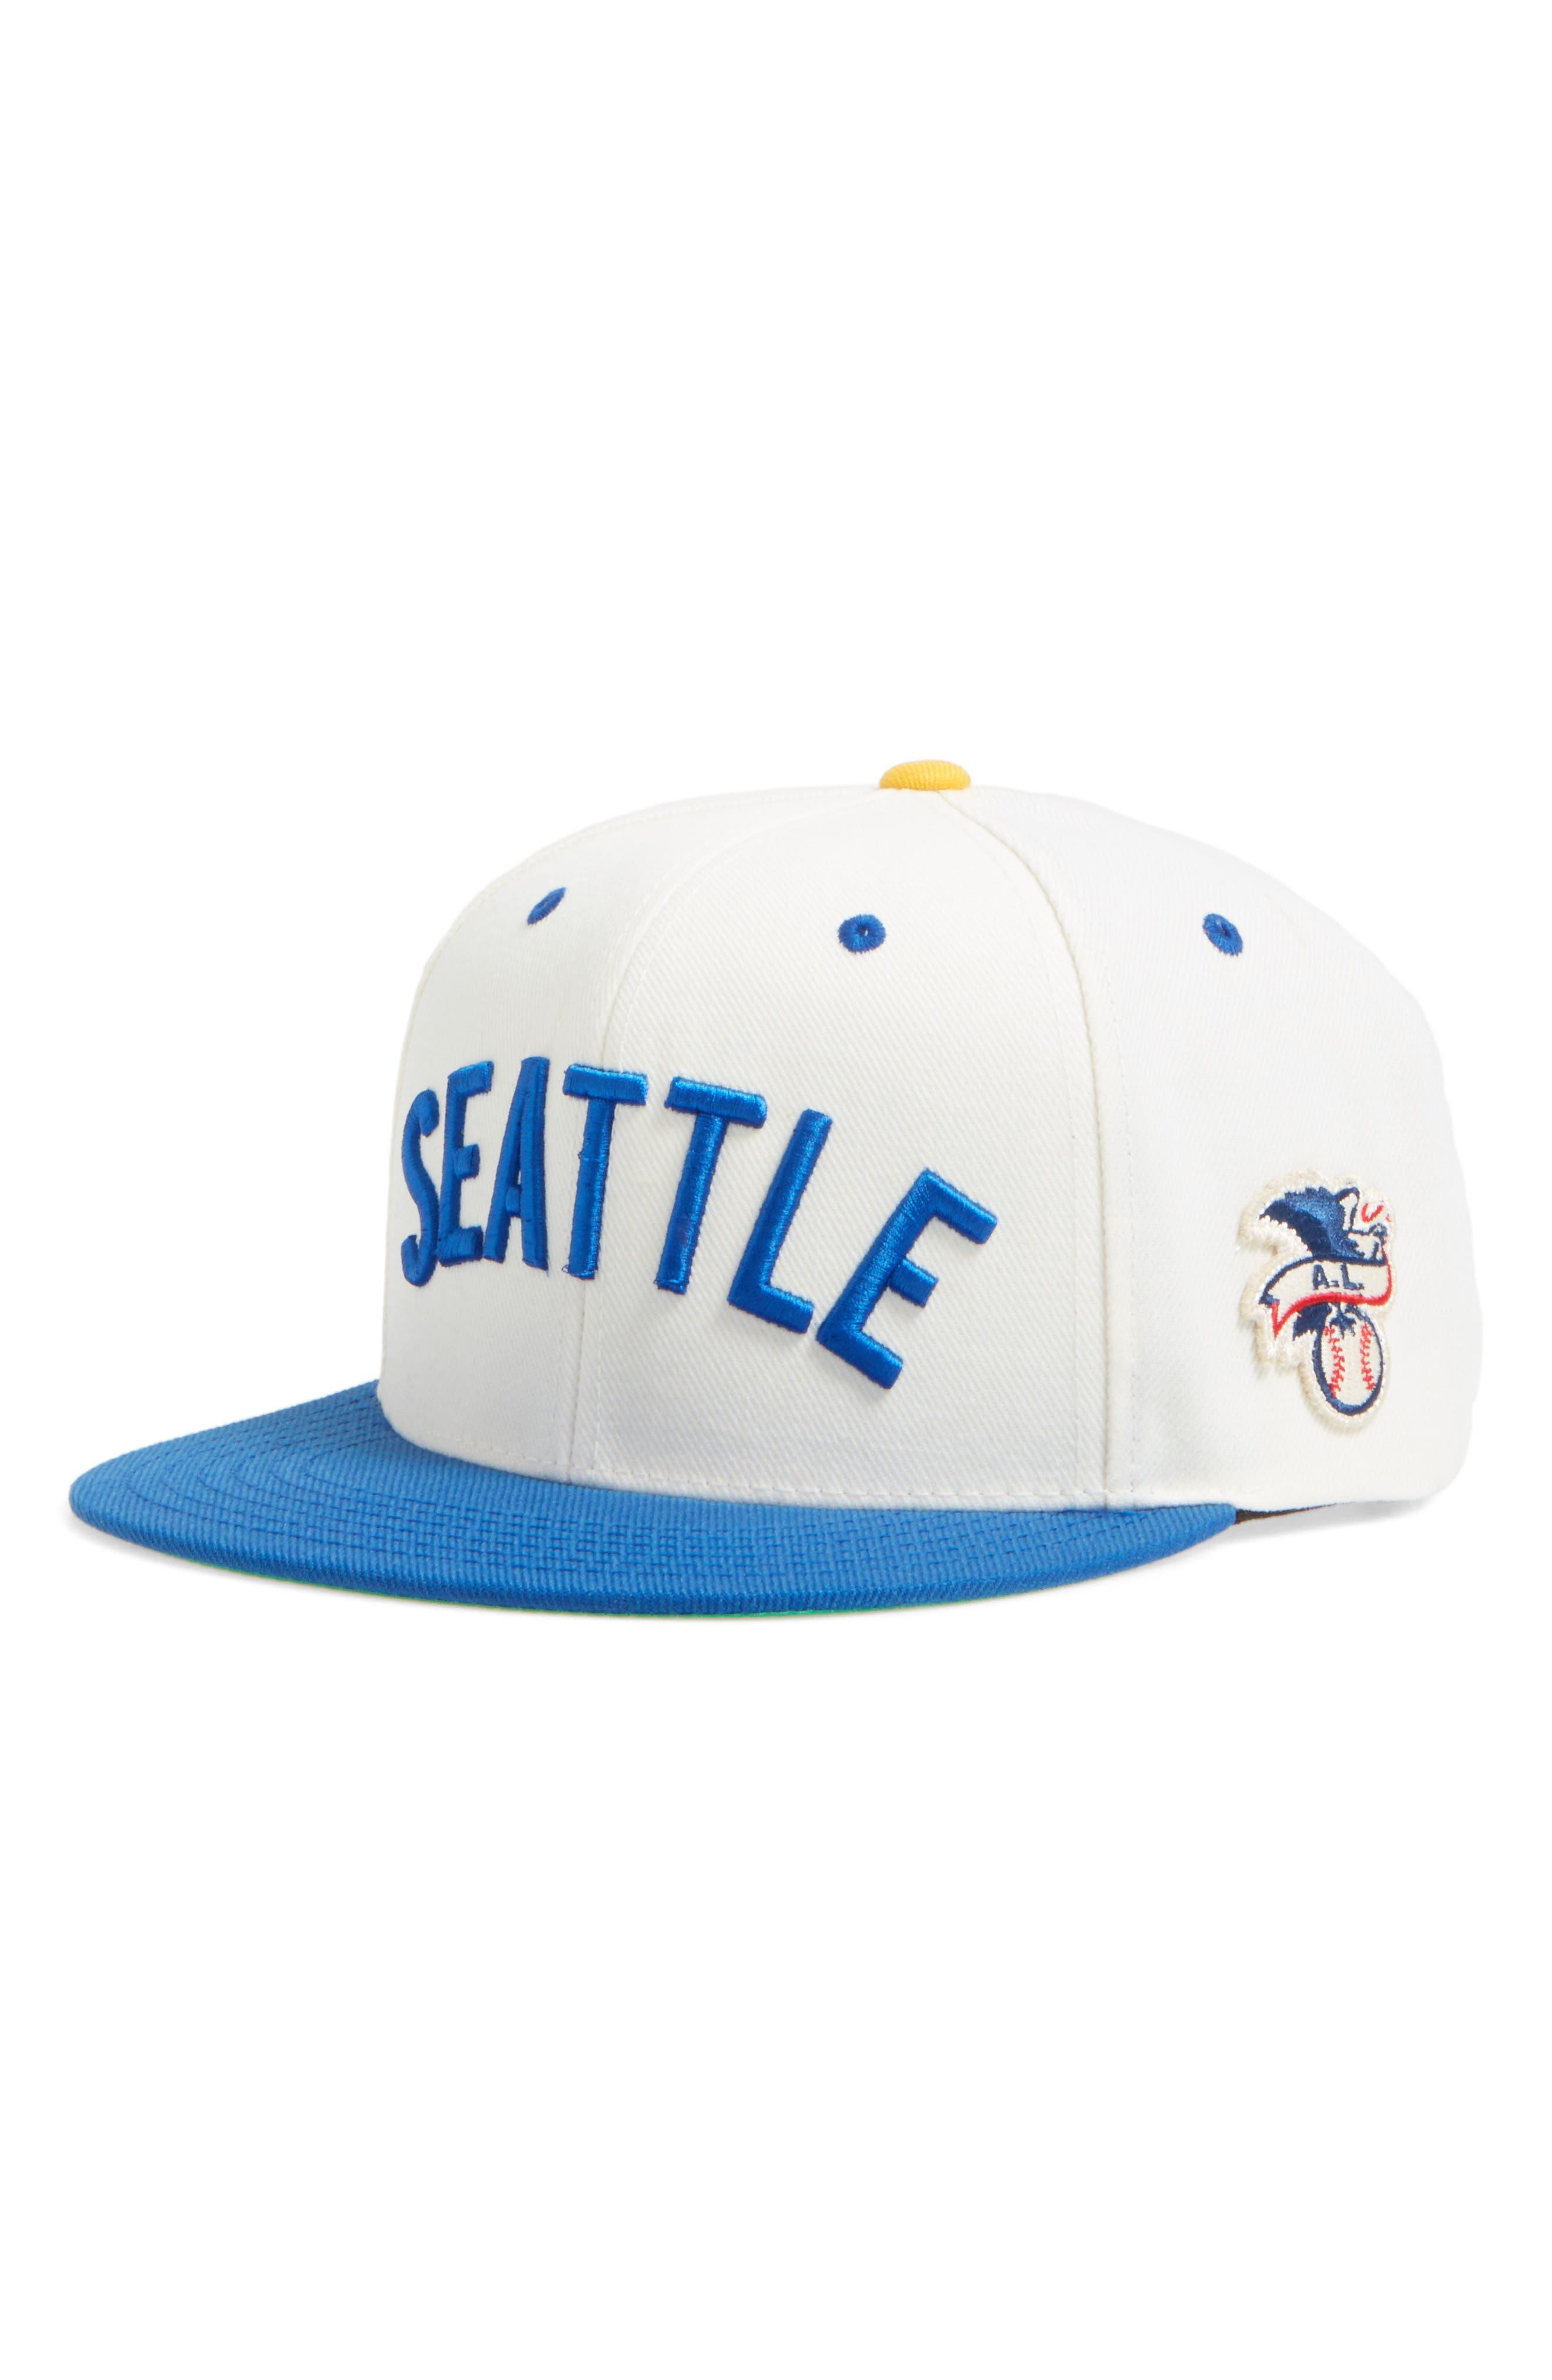 American Needle United MLB Snapback Baseball Cap